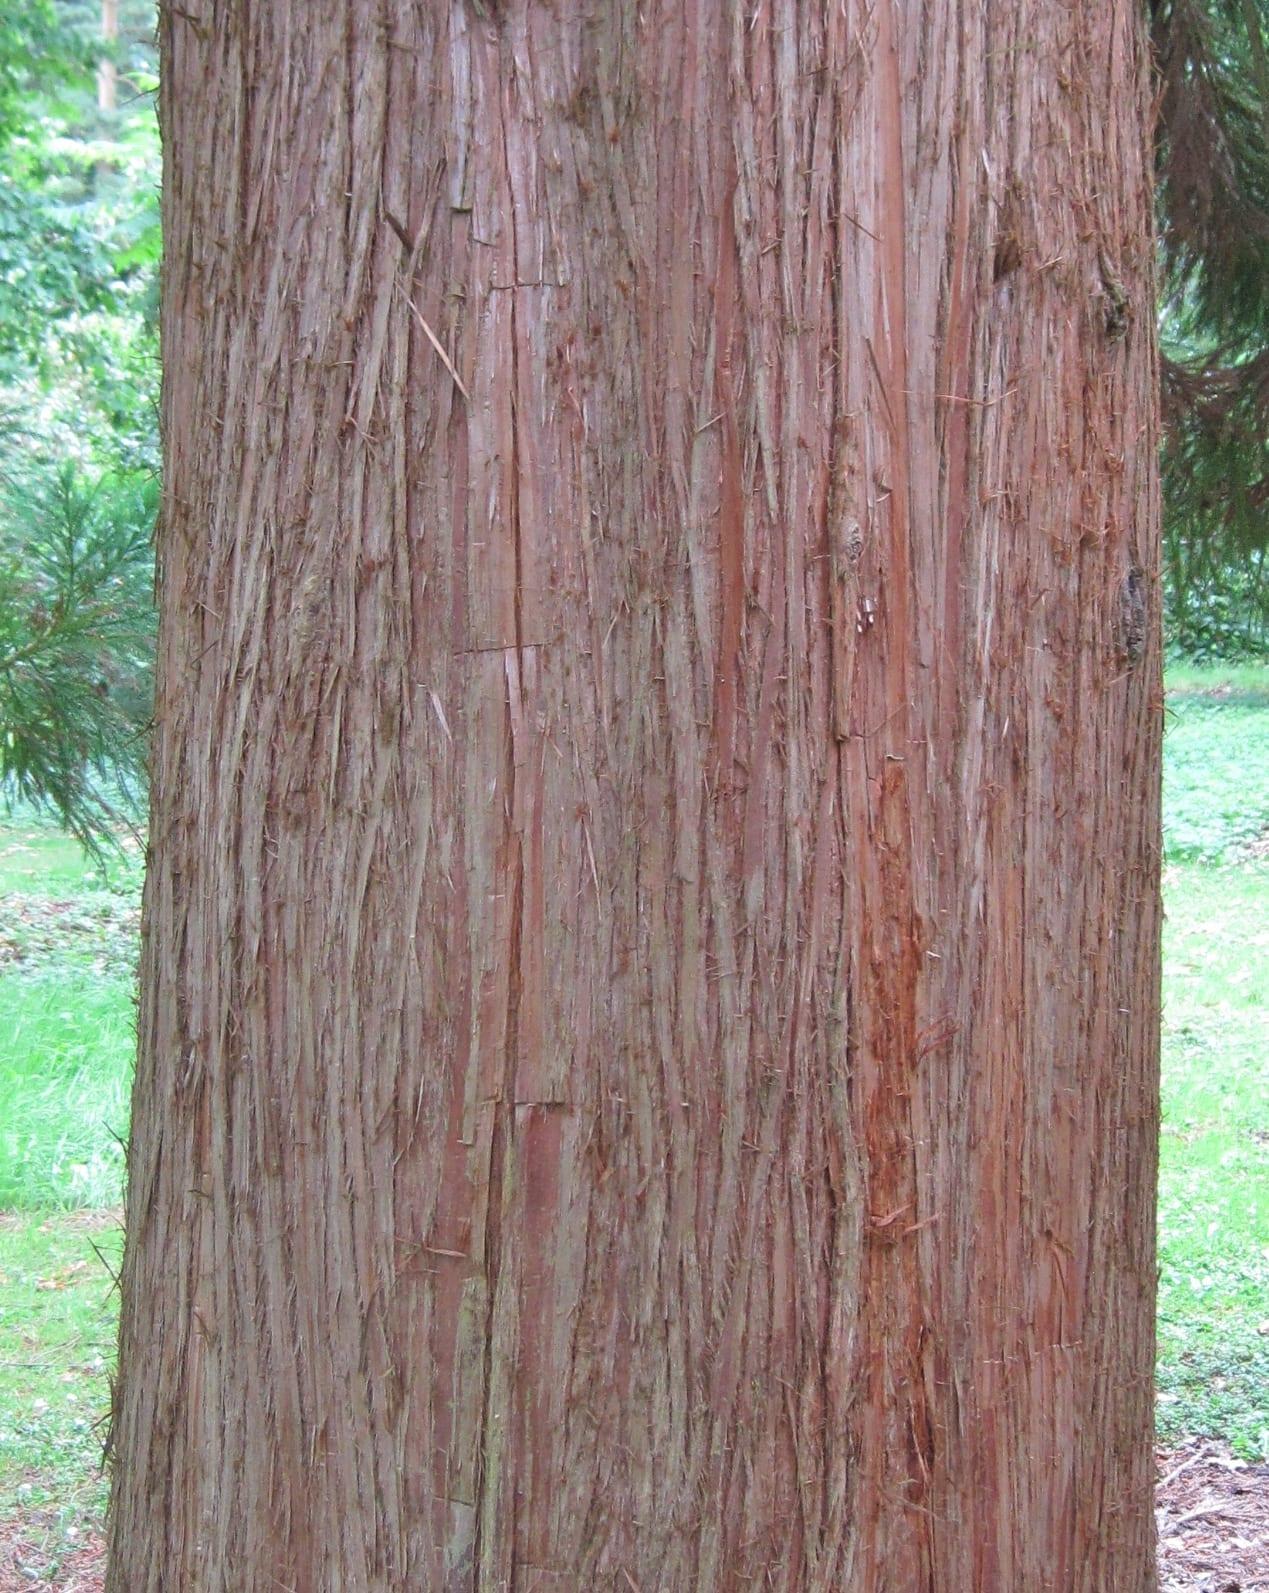 Japanese Red Cedar bark